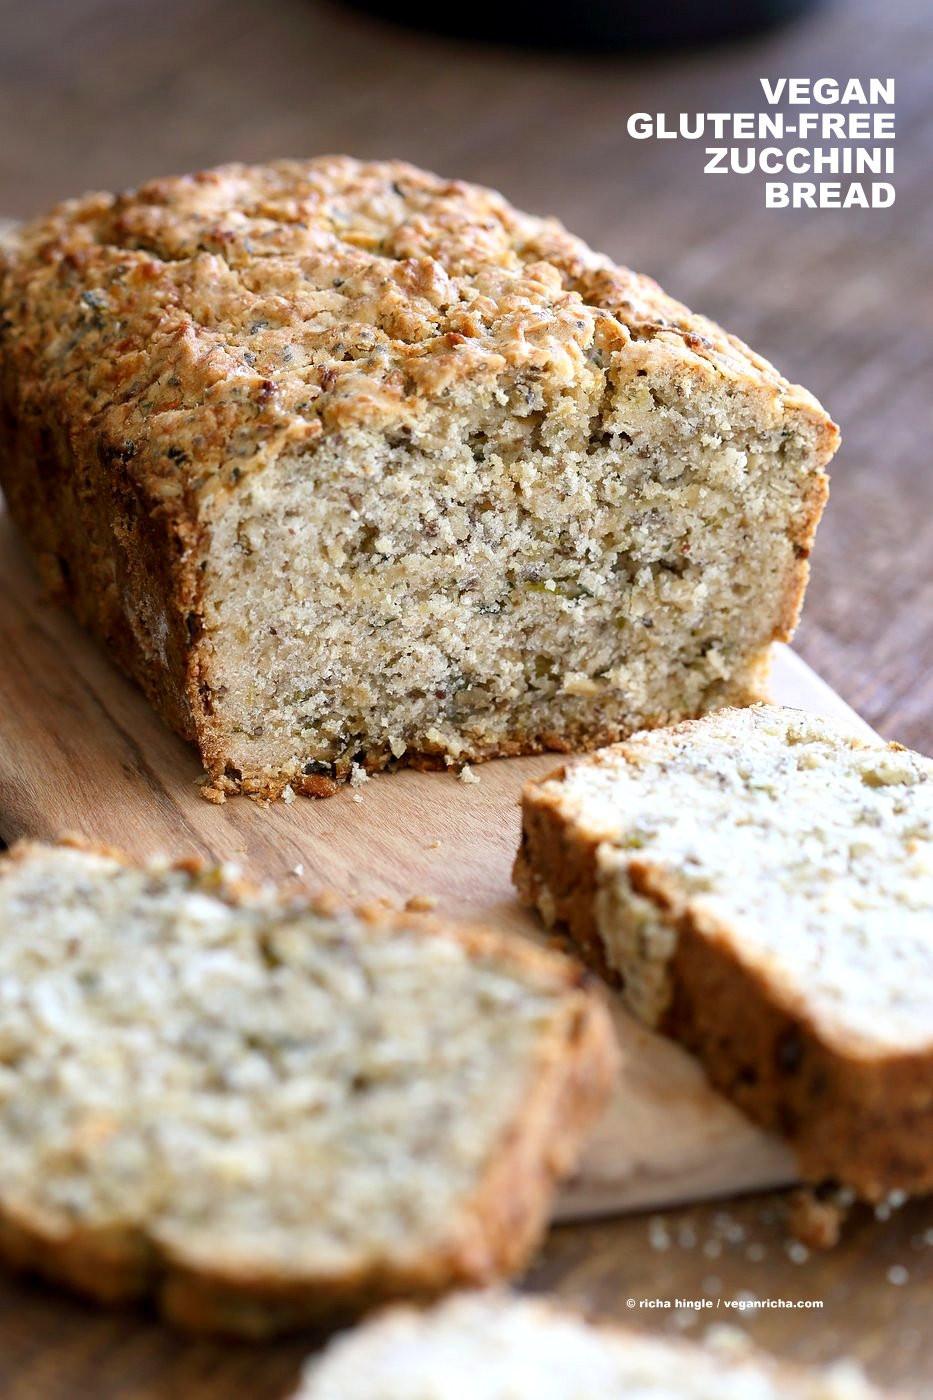 Gluten Free Dairy Free Bread  Vegan Gluten free Zucchini Bread Recipe Vegan Richa